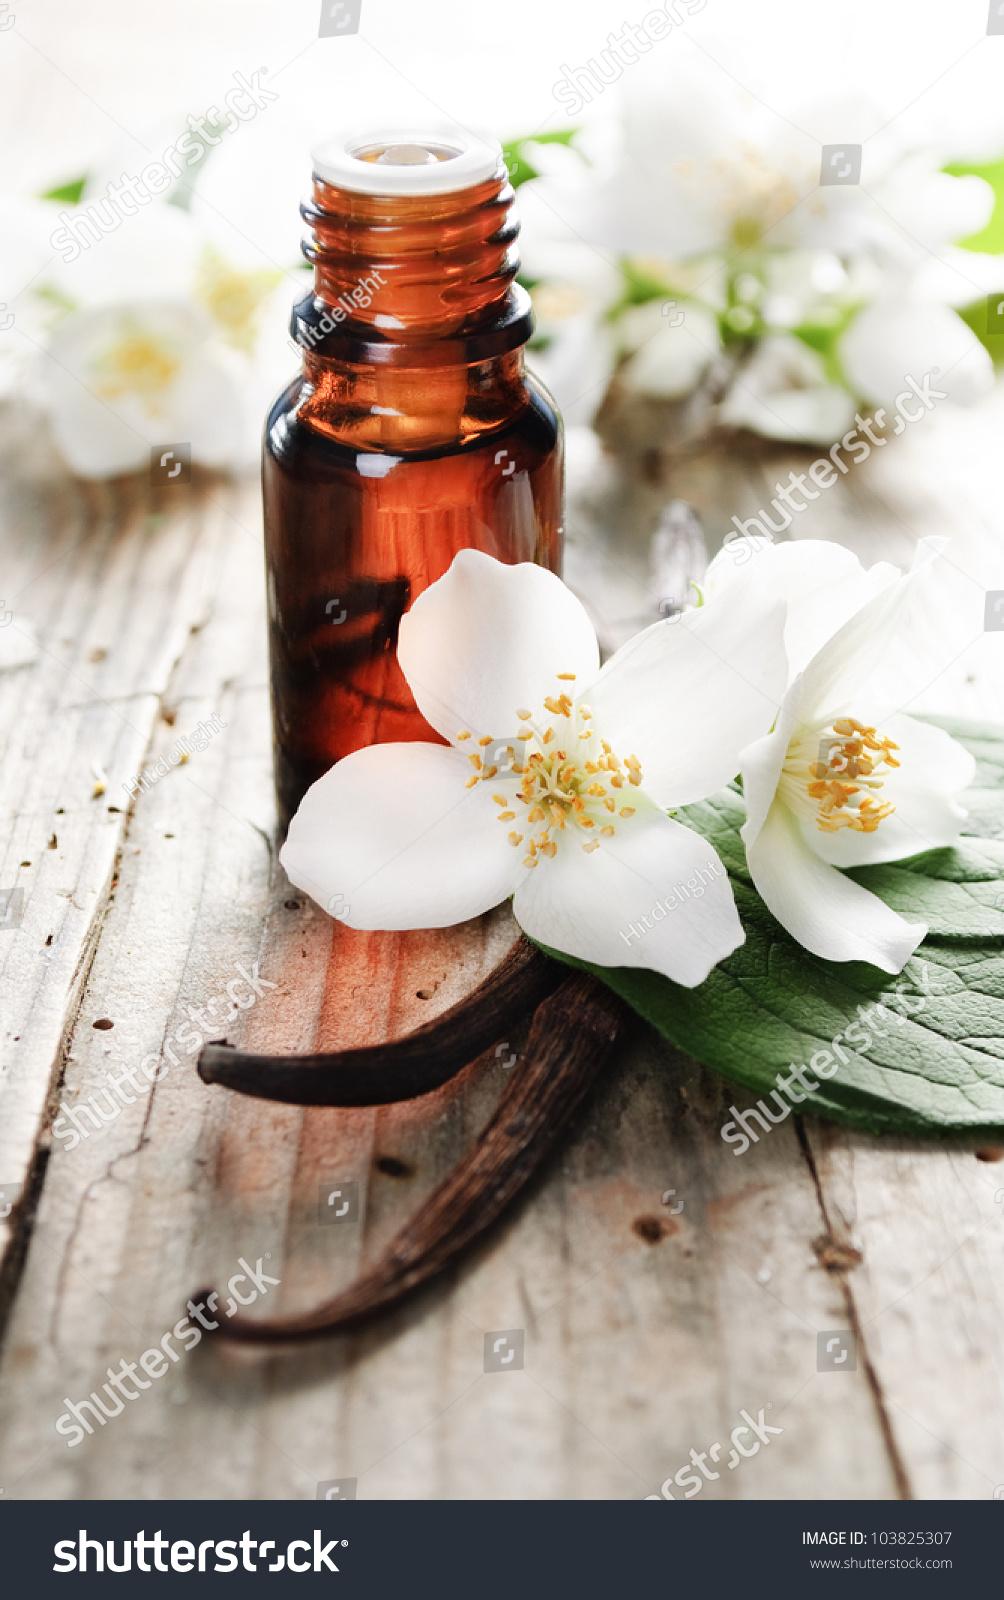 Essential Oil With Jasmine Flower On A Wooden Background Ez Canvas